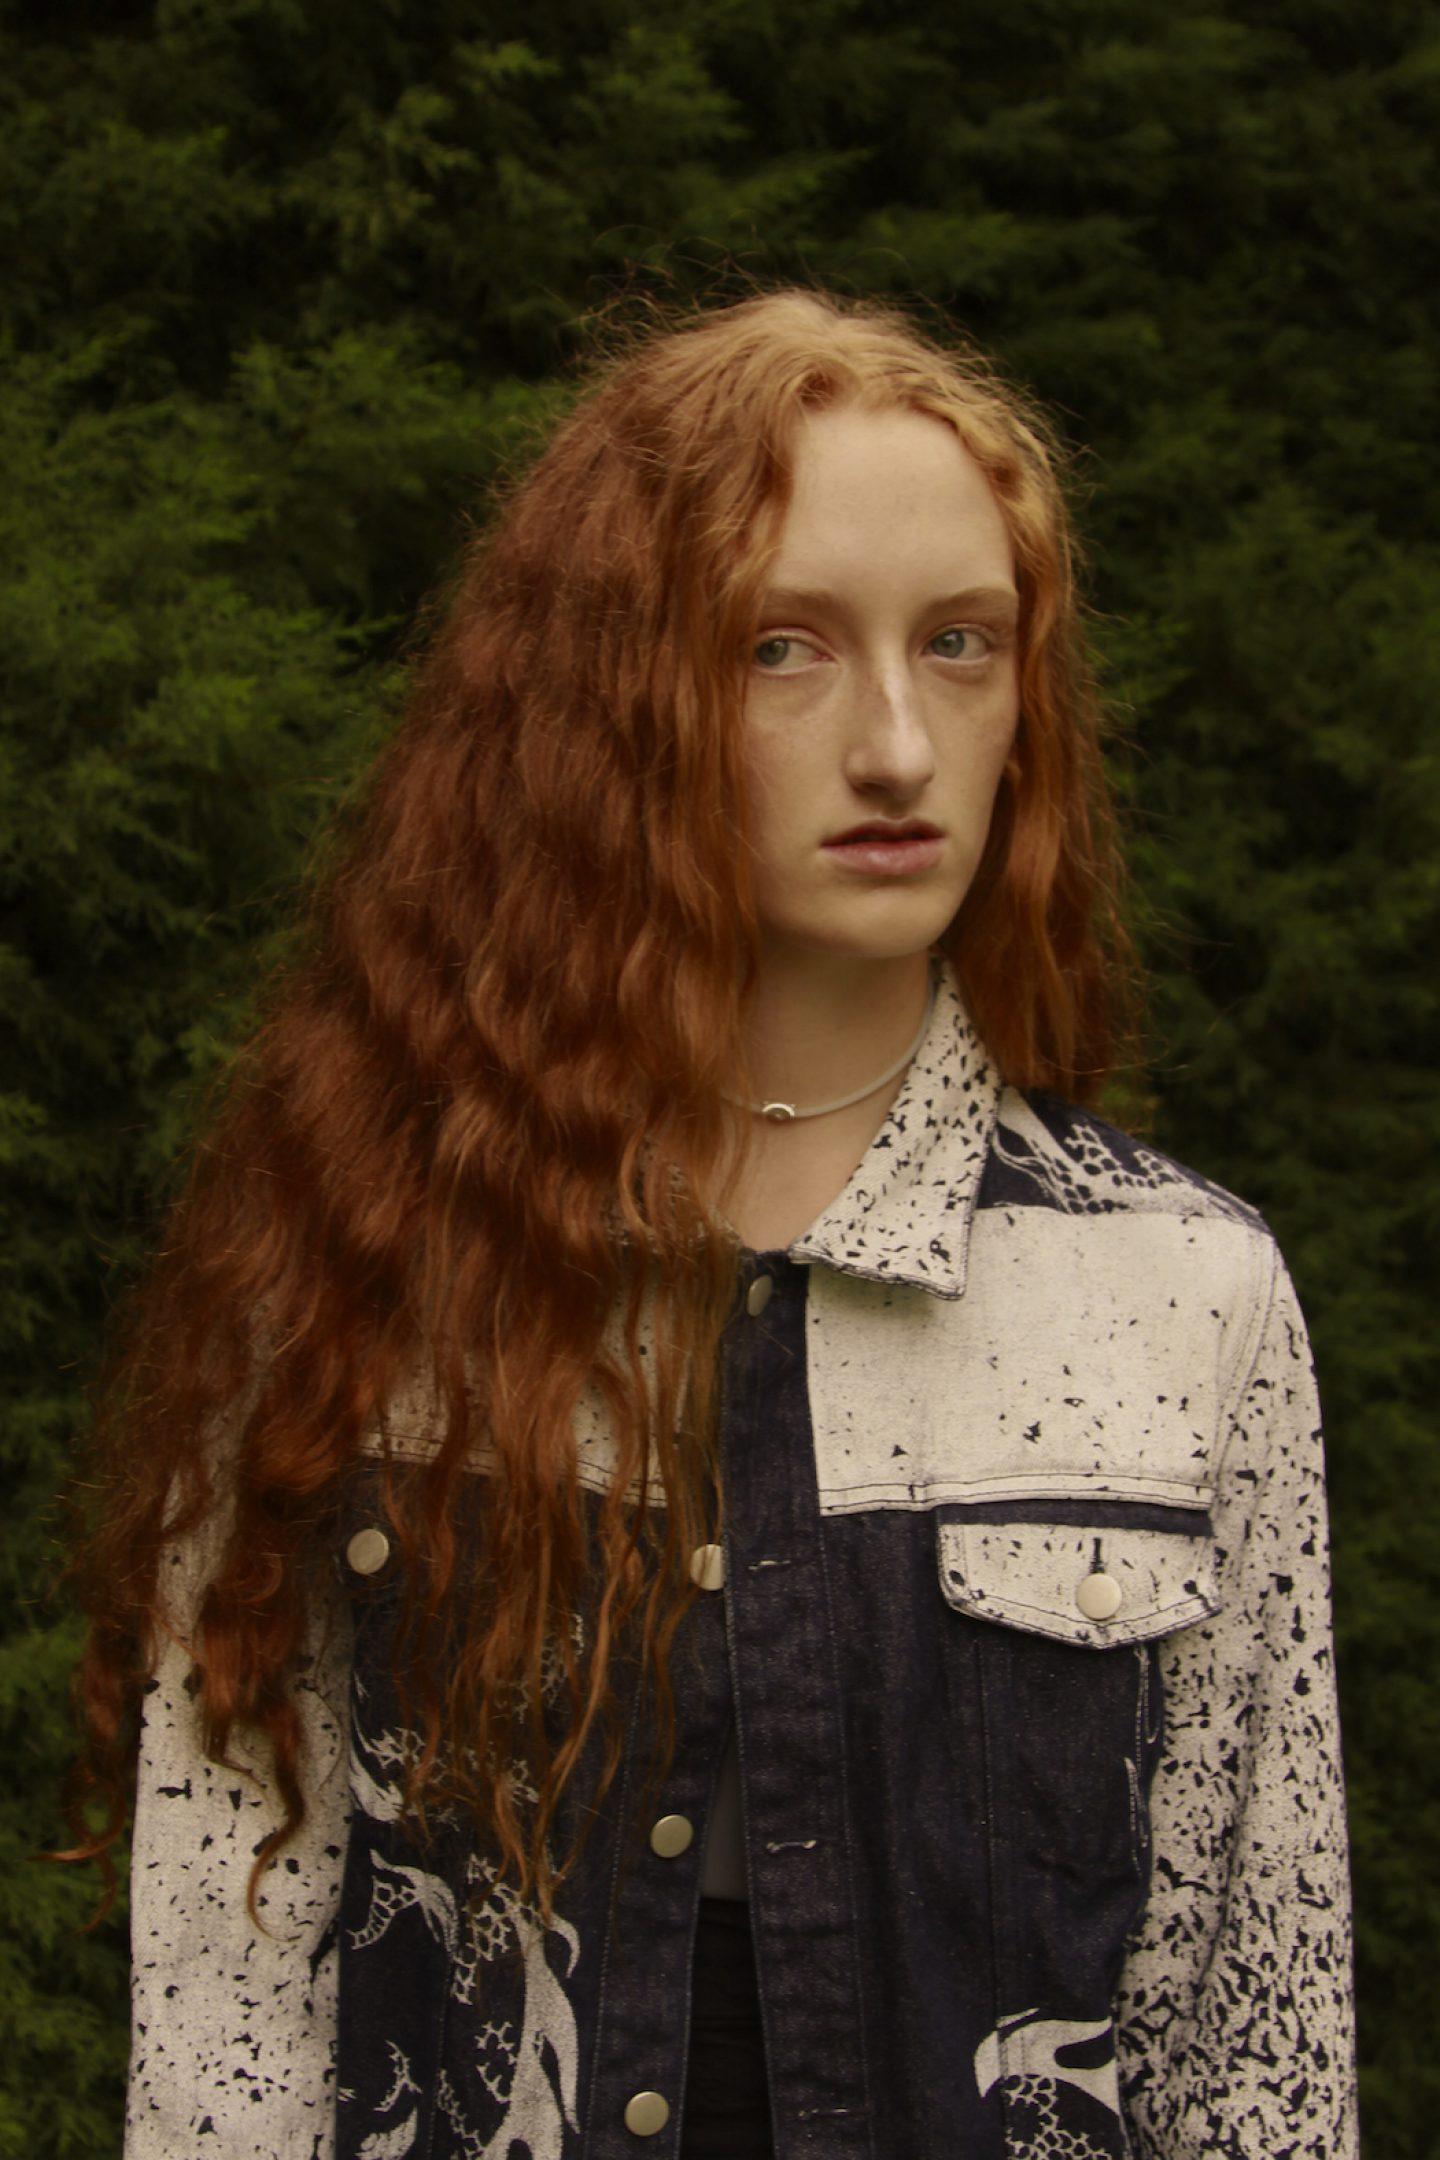 neverland_fashion_005